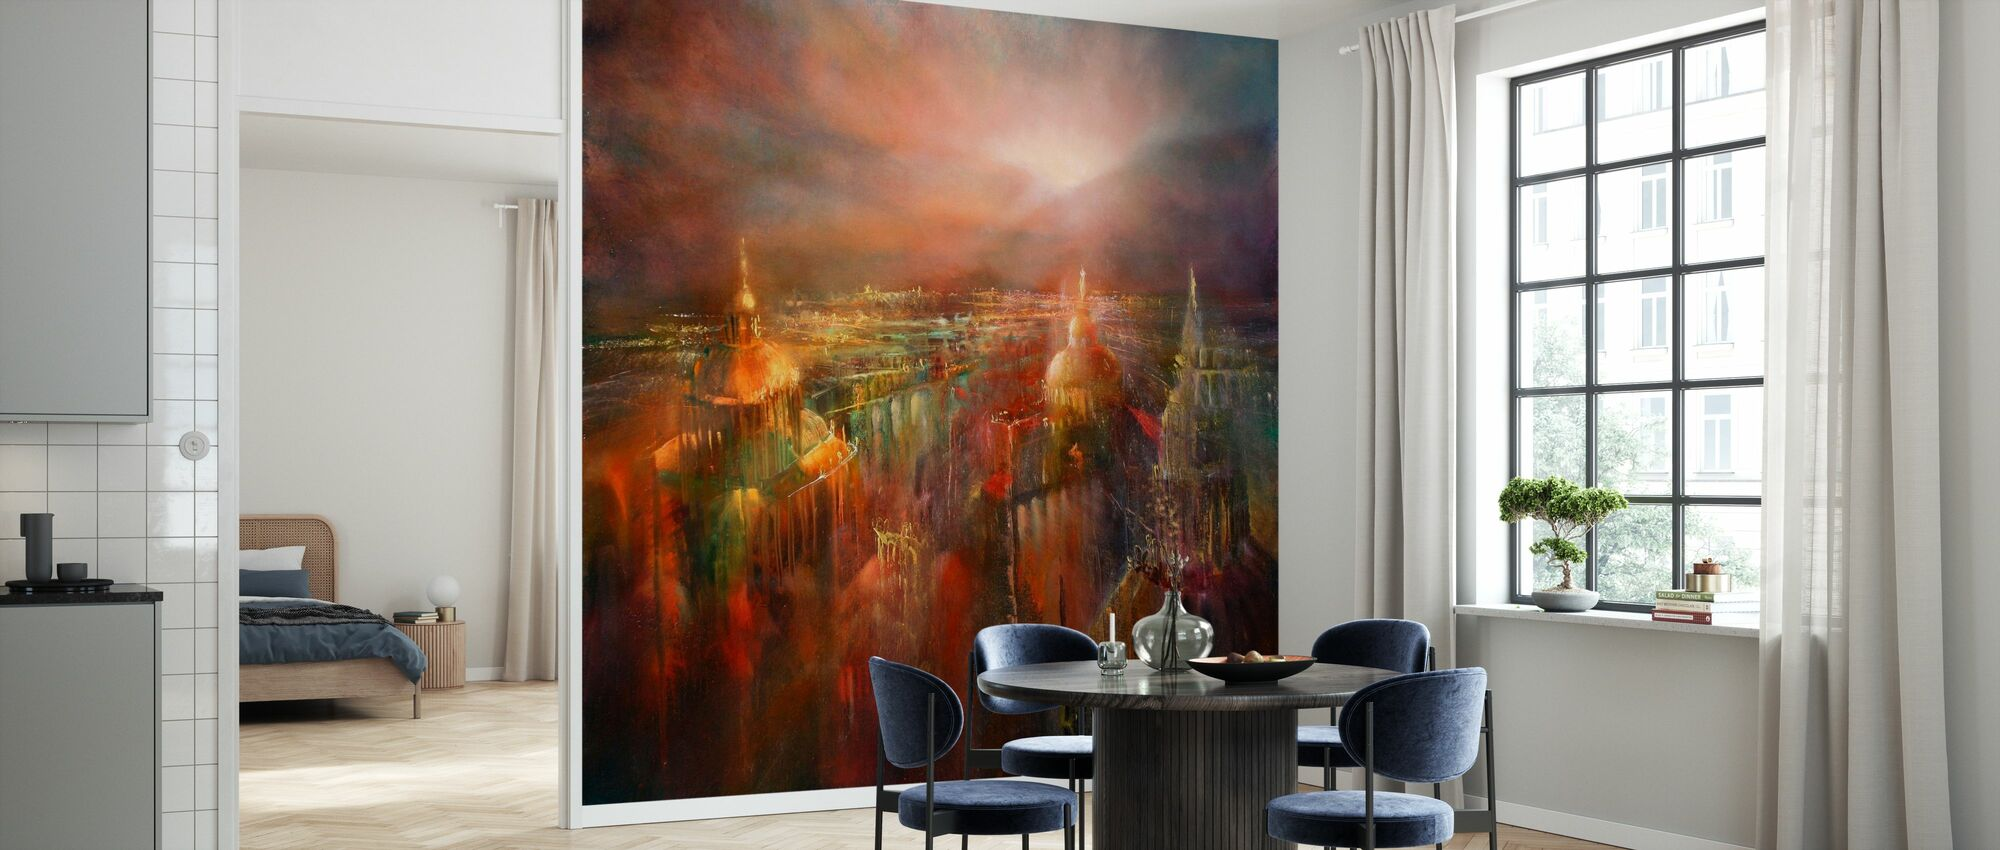 City Wakes Up - Wallpaper - Kitchen